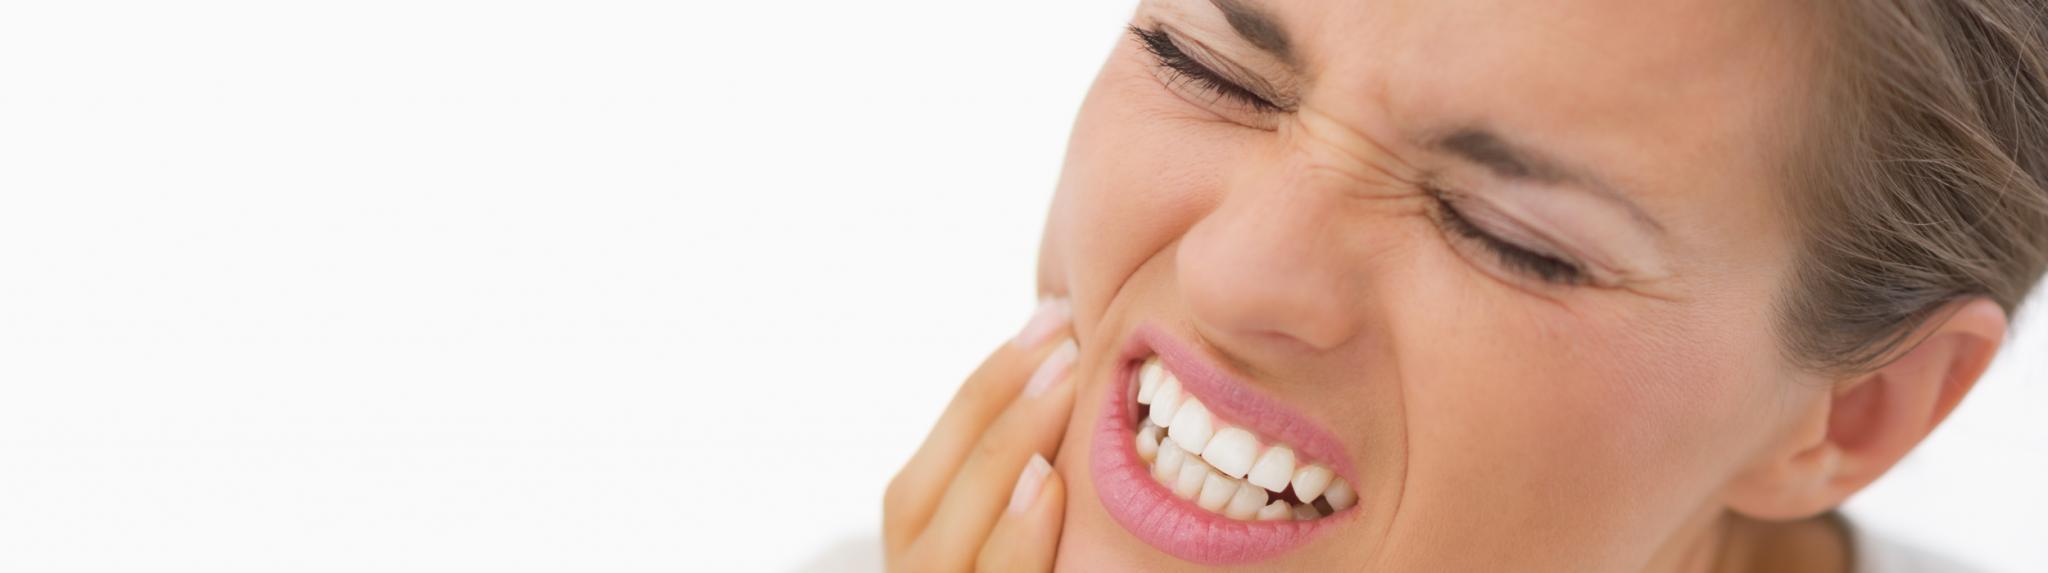 Moncton Dentist offering emergency dental service